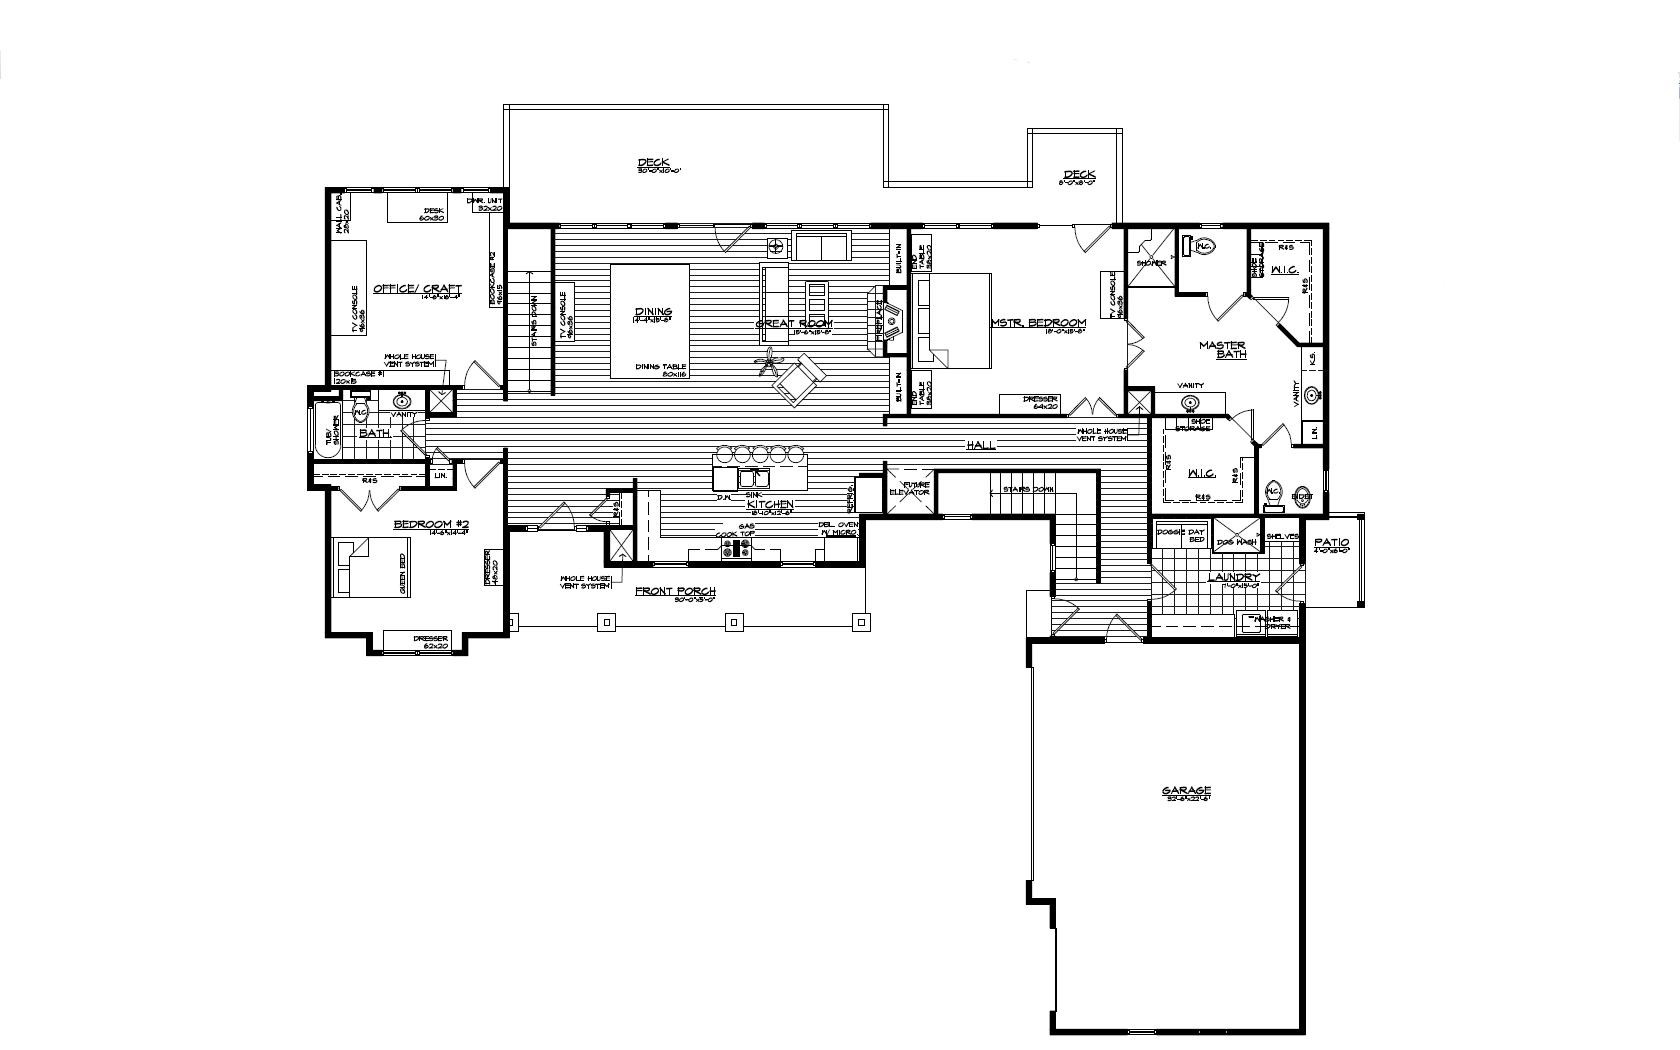 custome house plan